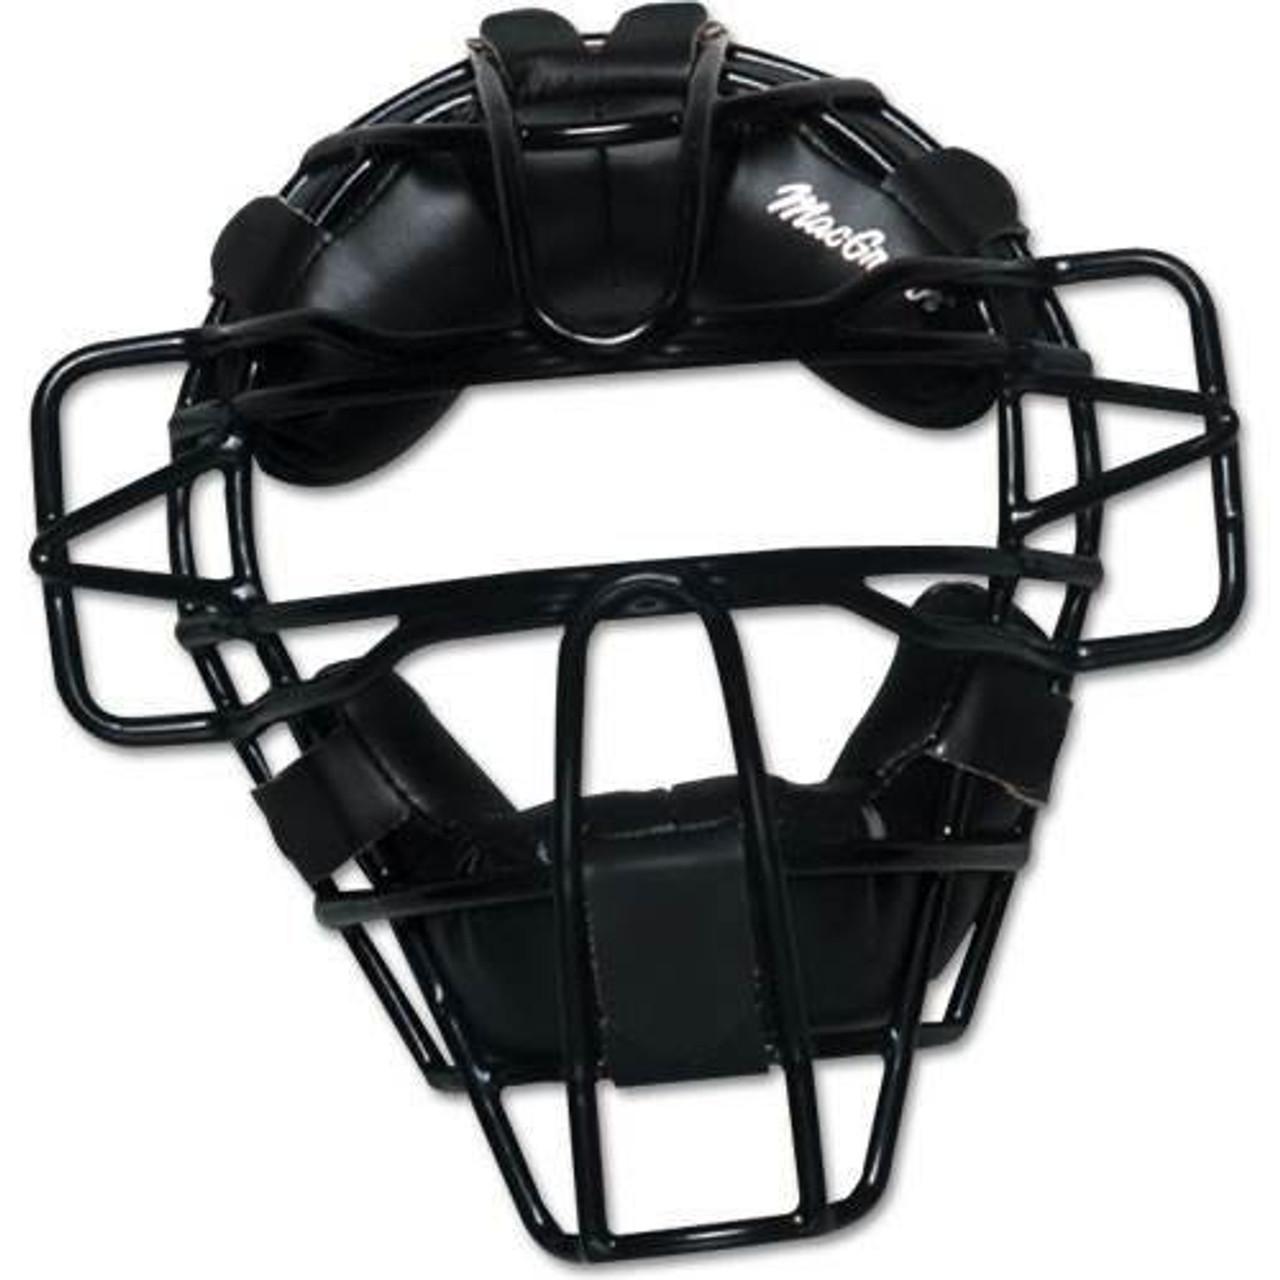 MacGregor #B29 Pro 100 Mask for baseball or softball umpire